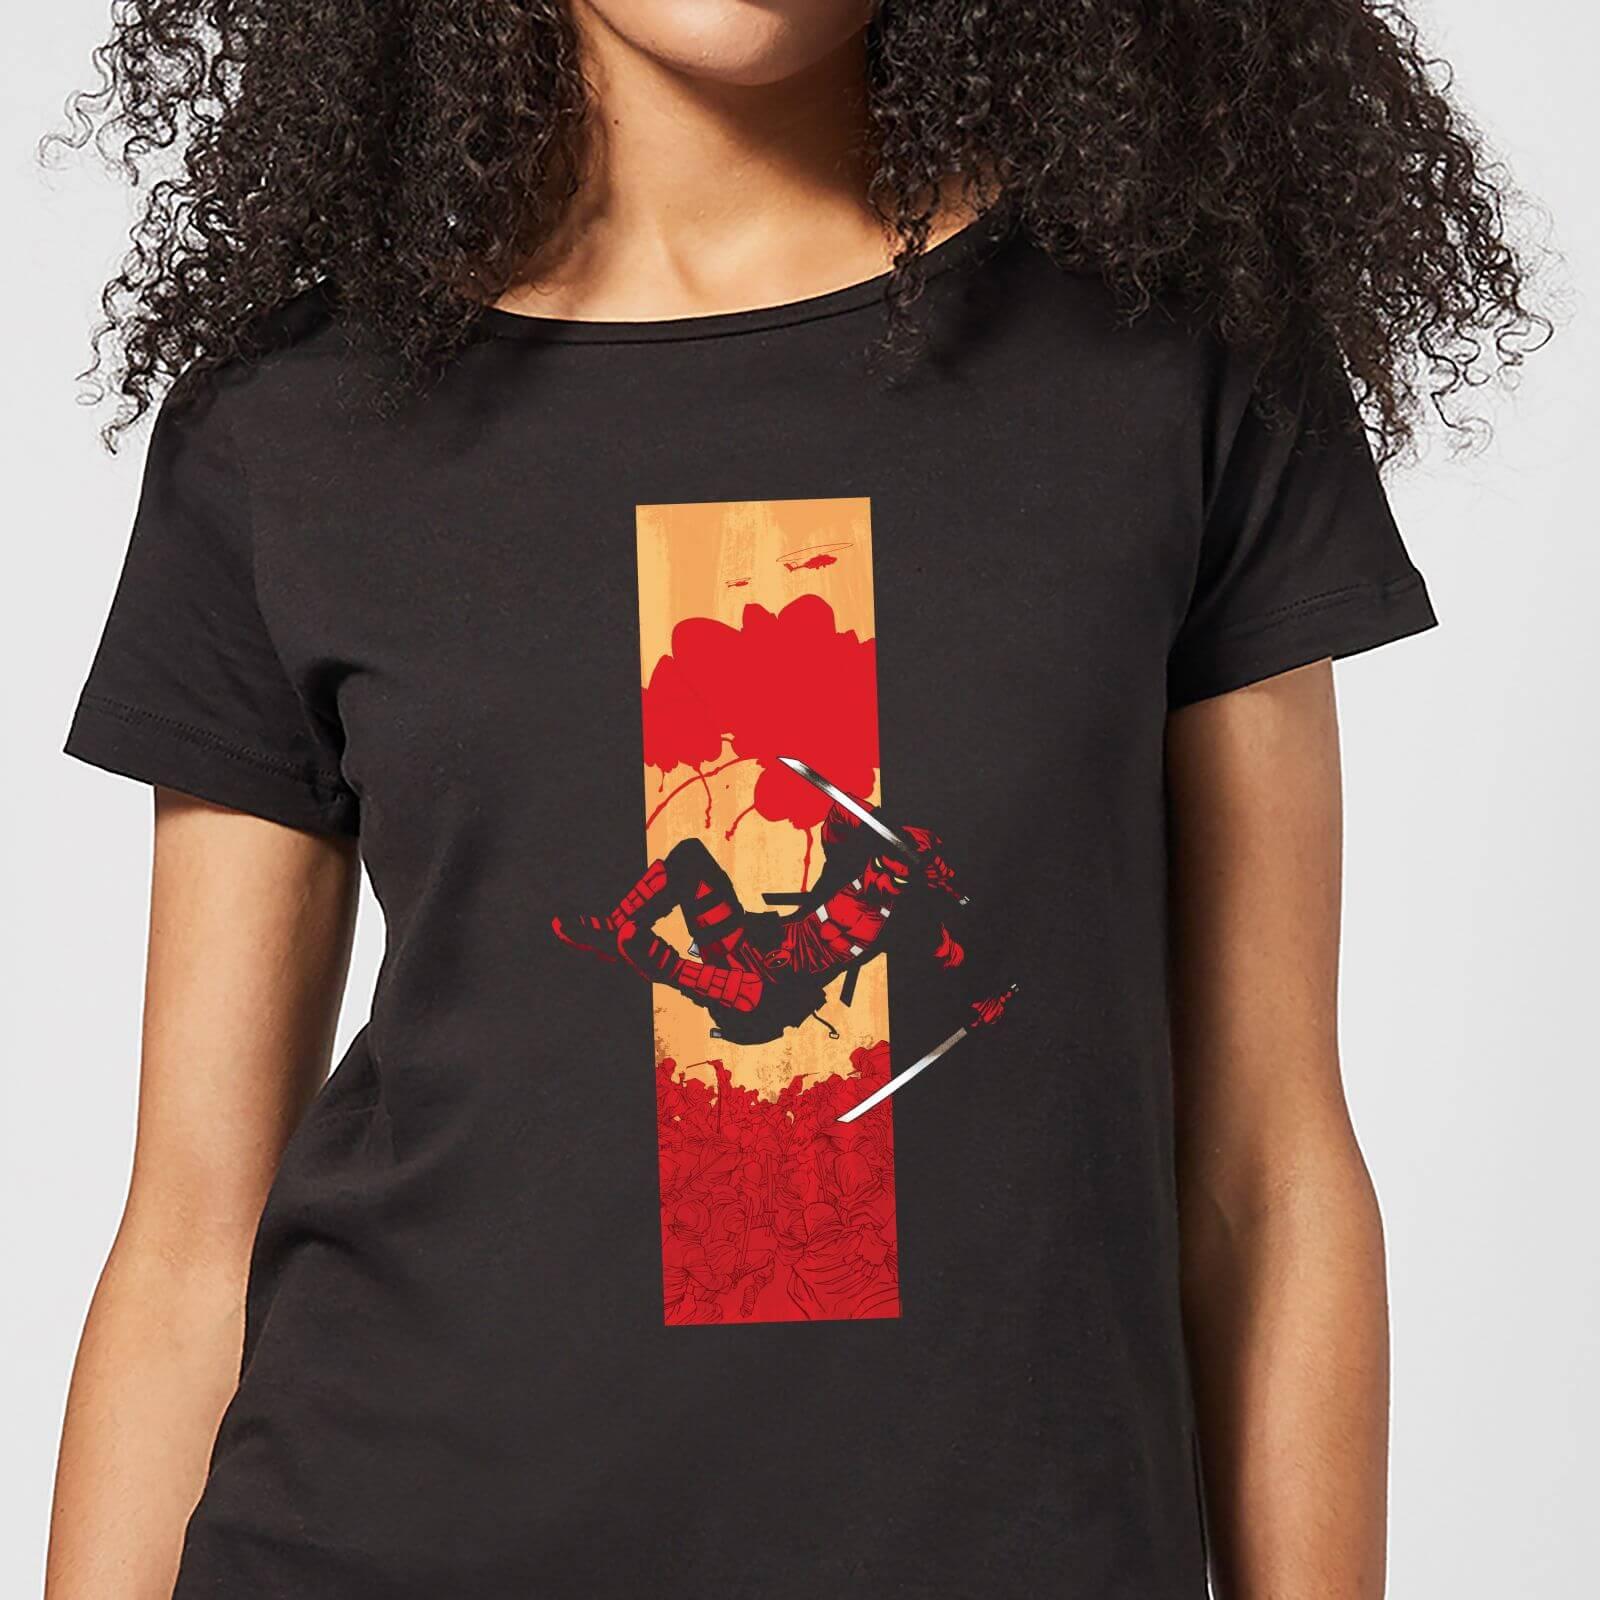 OfferteWeb.click 07-t-shirt-marvel-deadpool-blood-strip-nero-donna-xxl